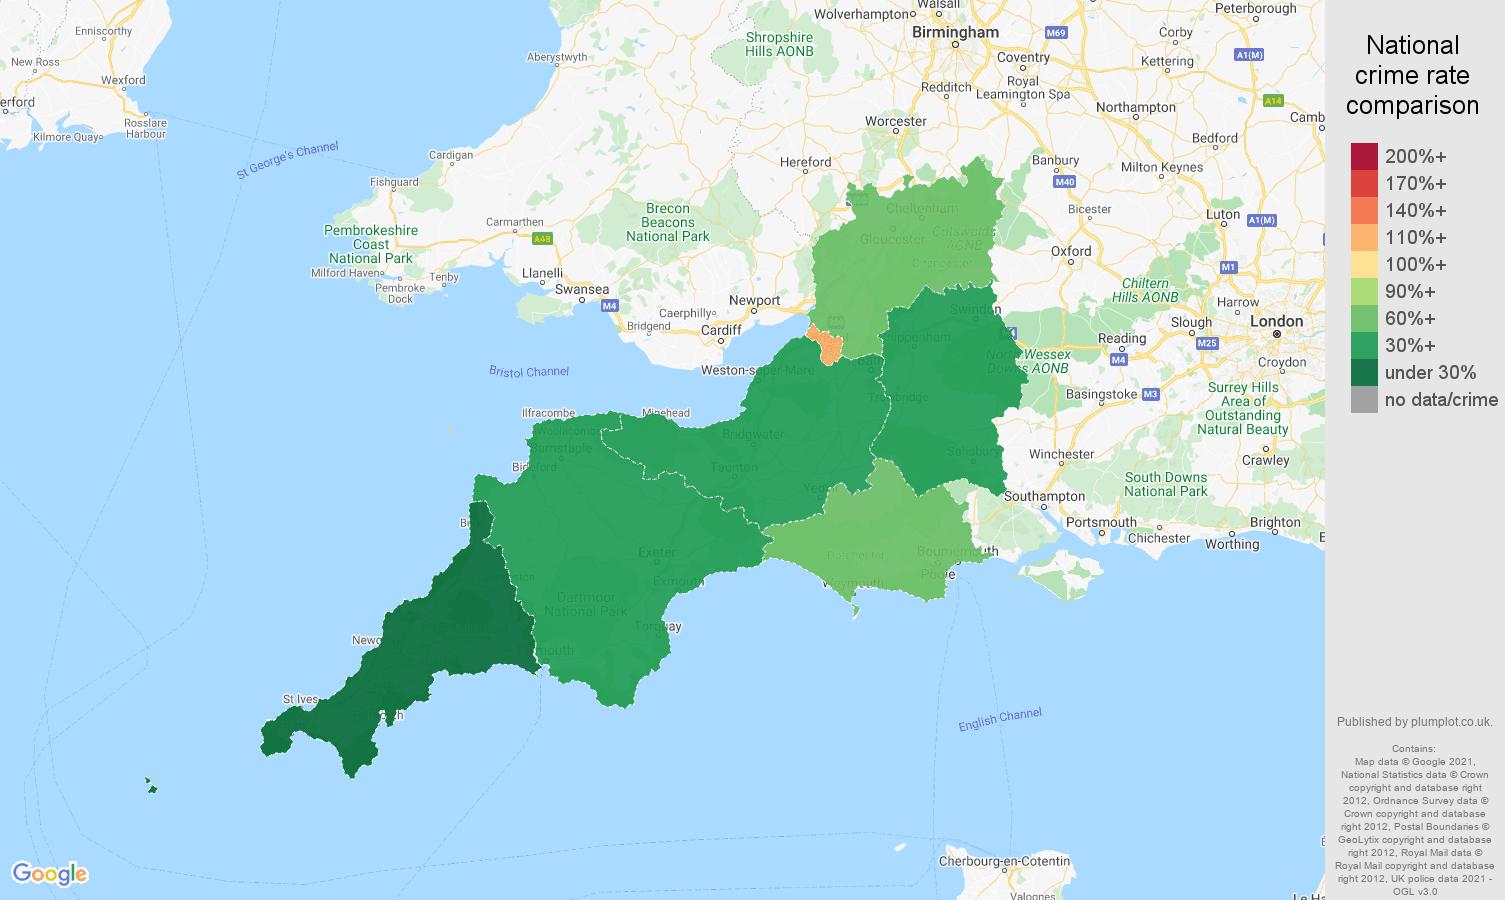 South West vehicle crime rate comparison map